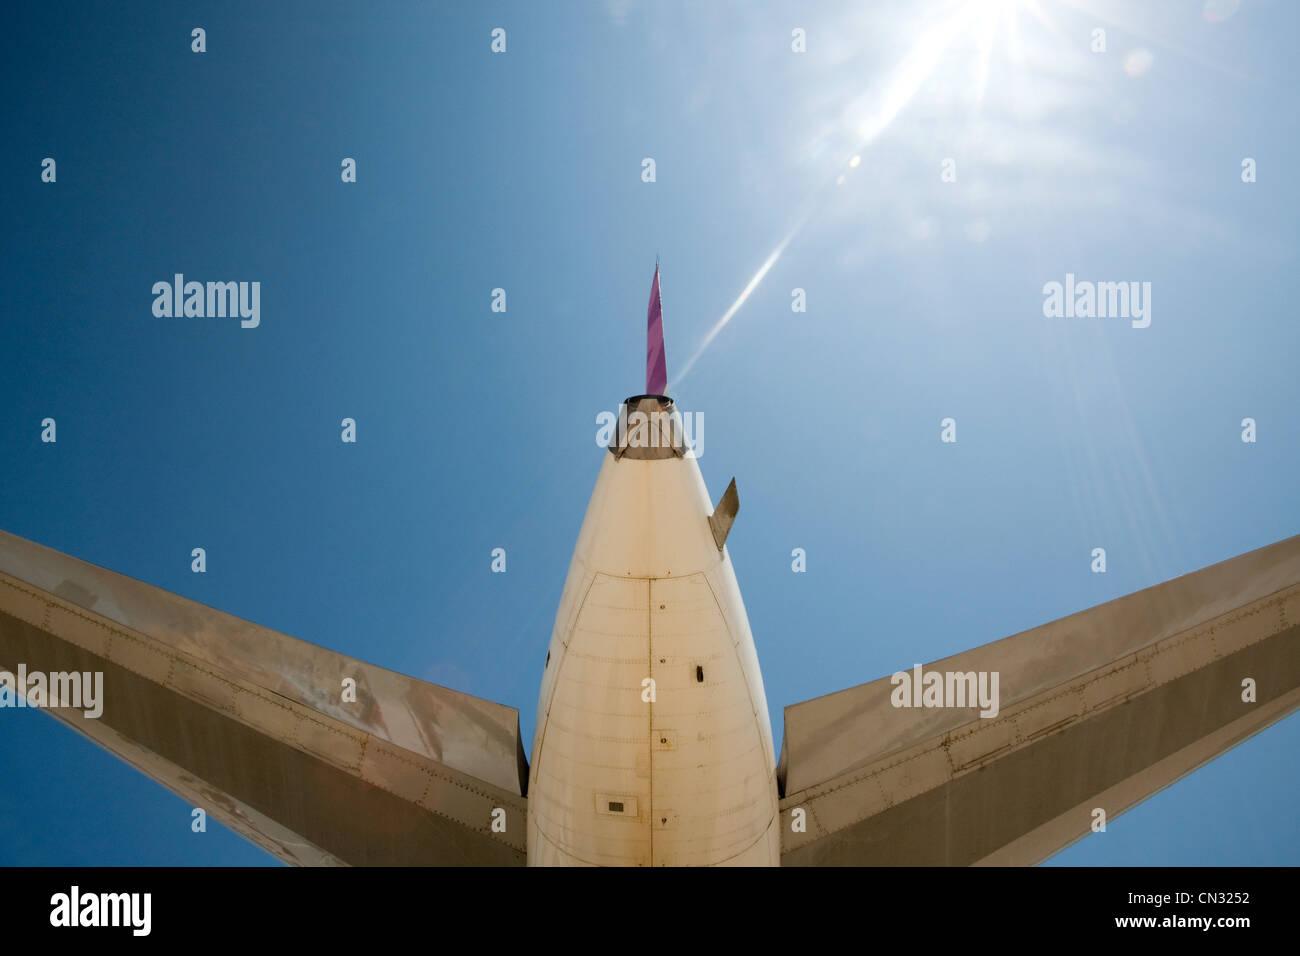 Airplane, low angle - Stock Image